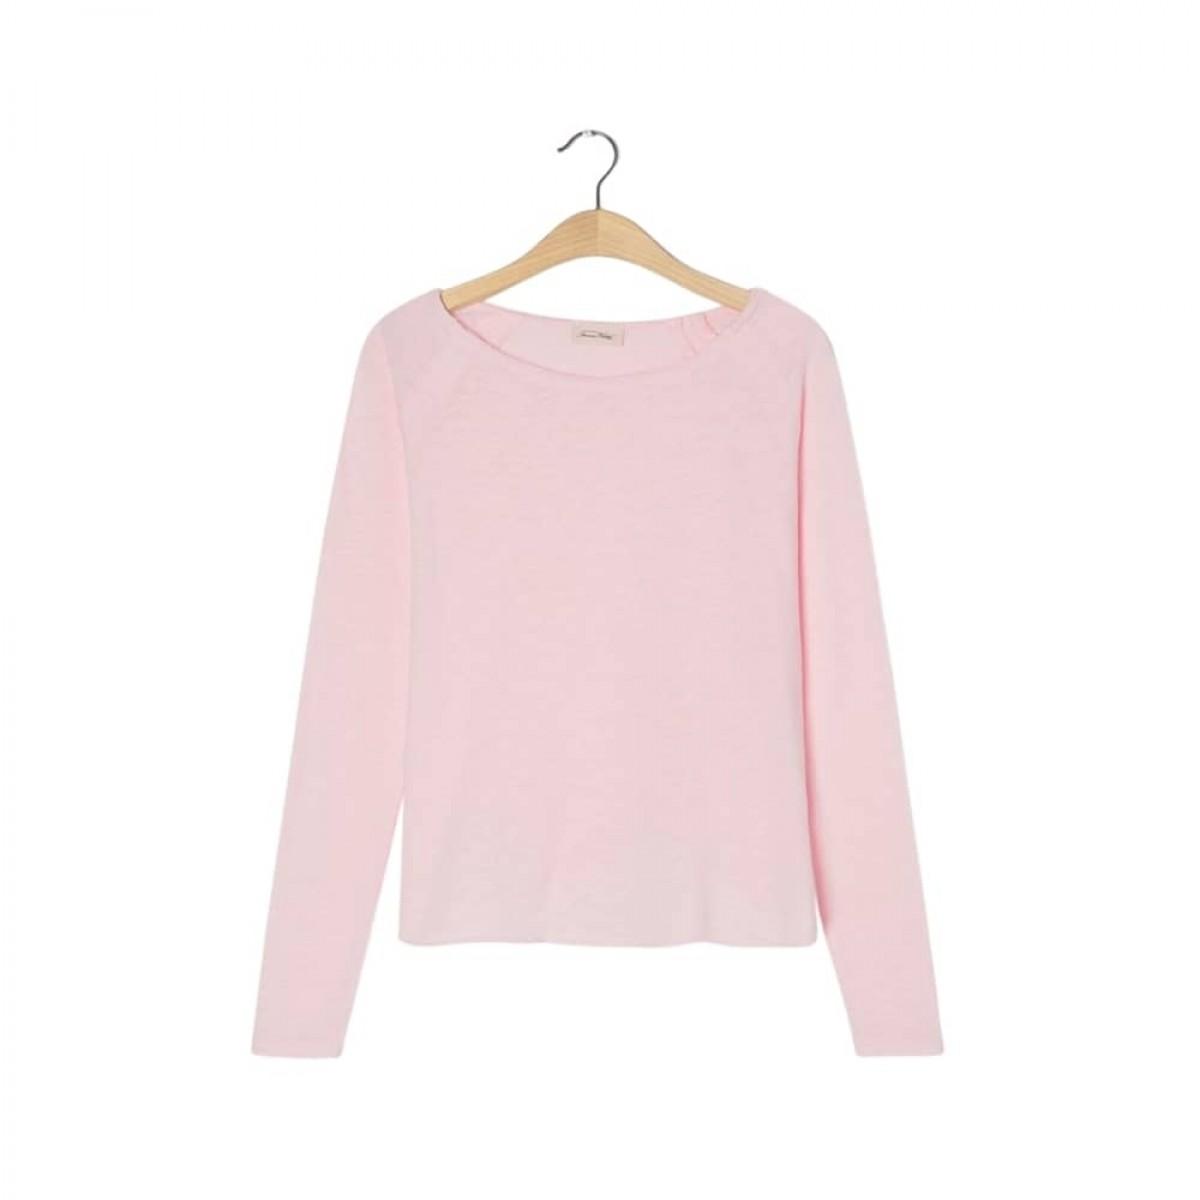 sonoma bluse - vintage pinkish